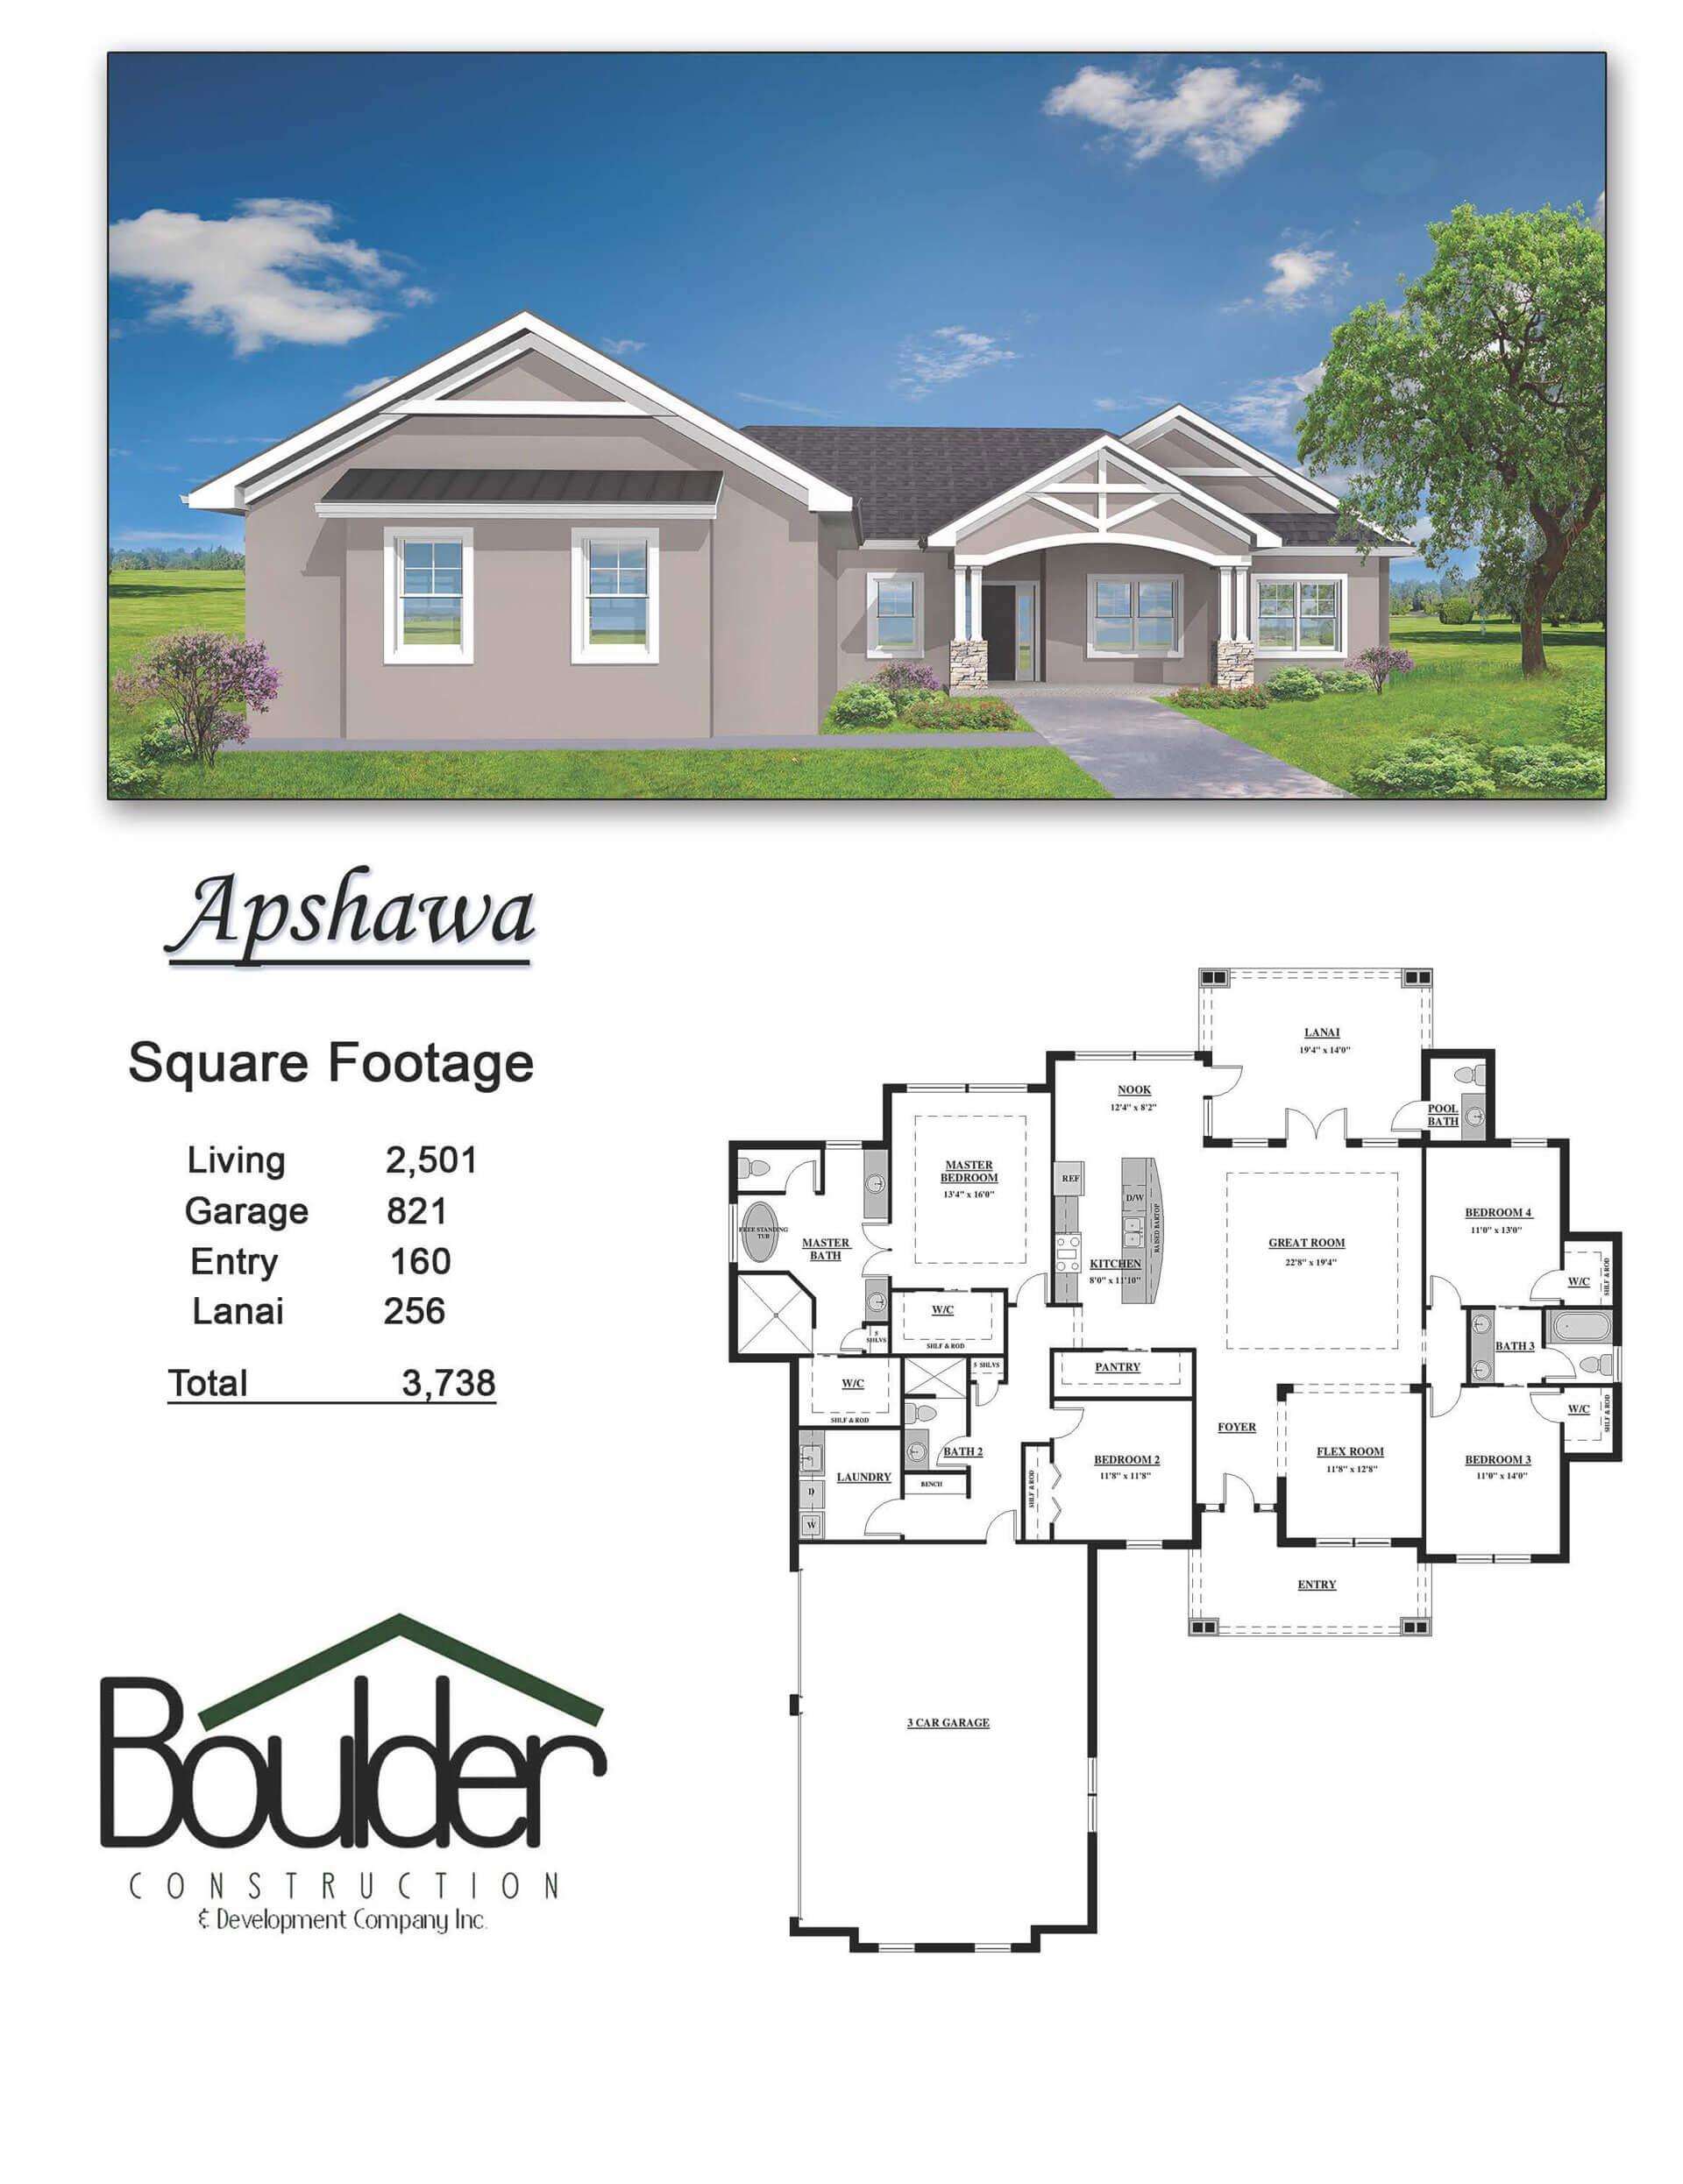 boulder-construction-apshawa-floor-plan